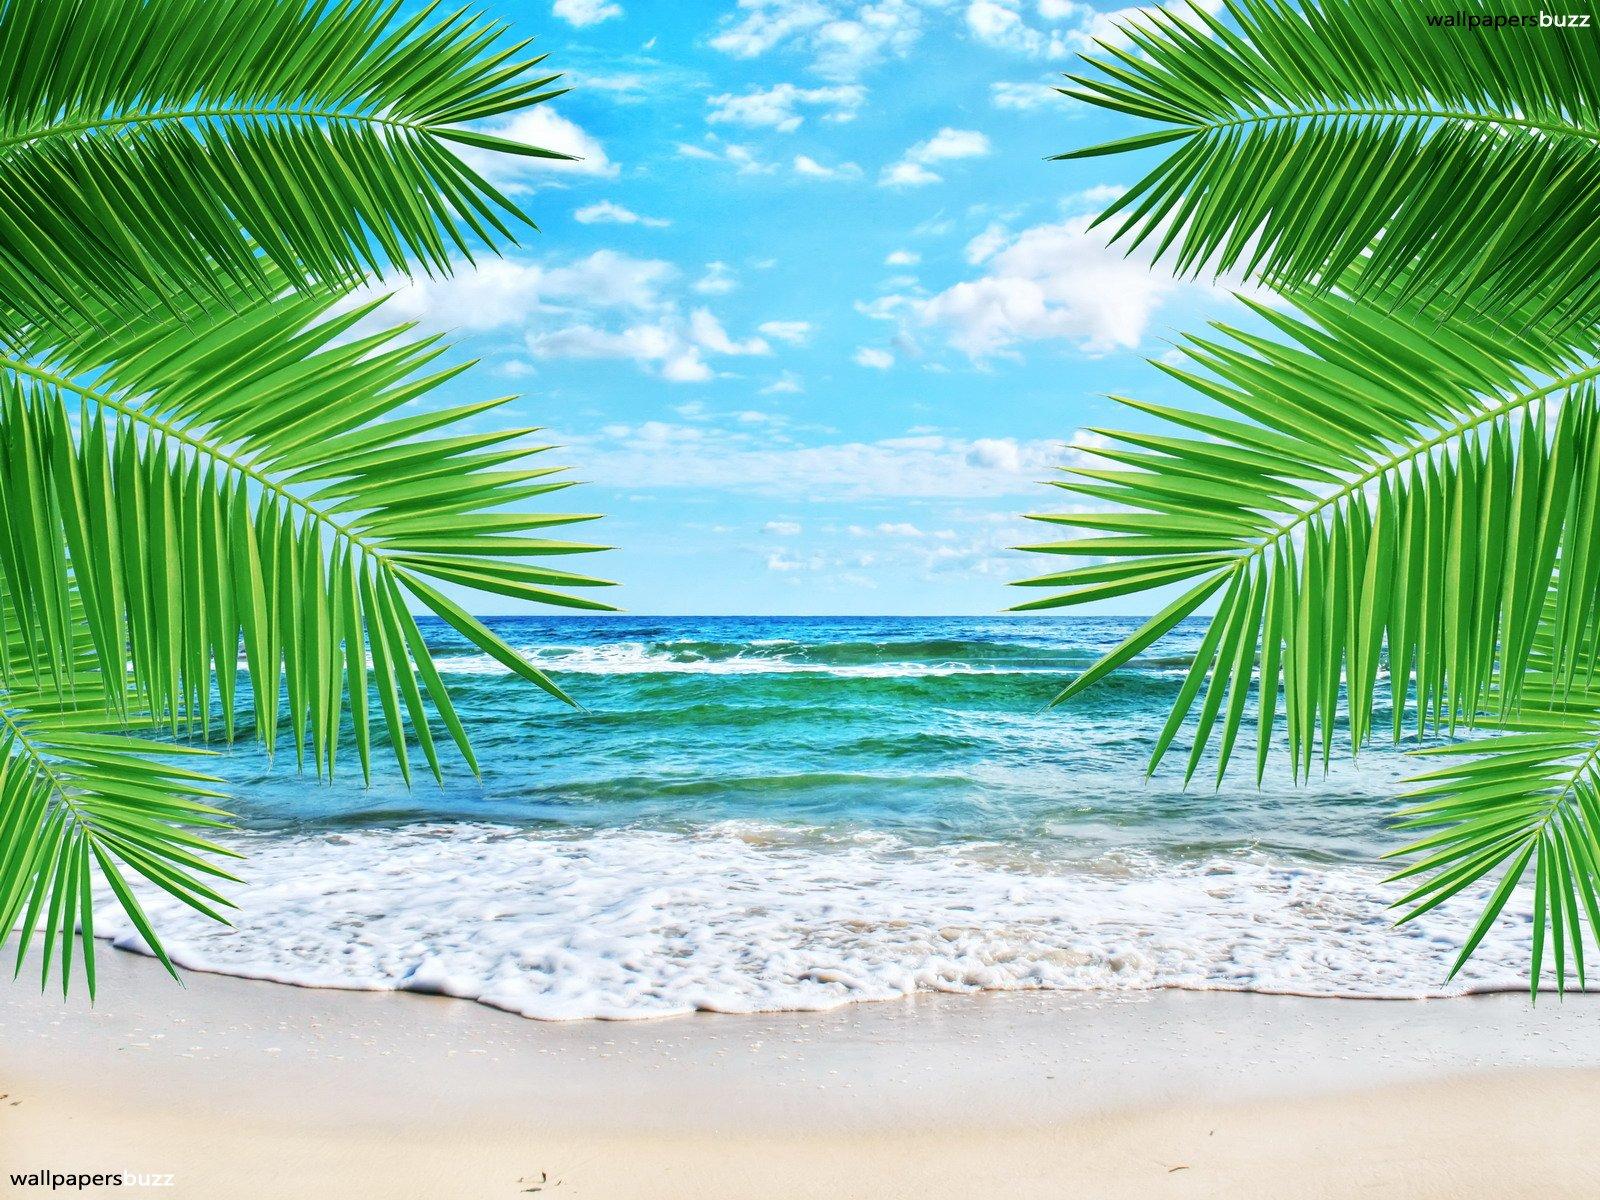 Beach Wallpaper Hd 1600x1200